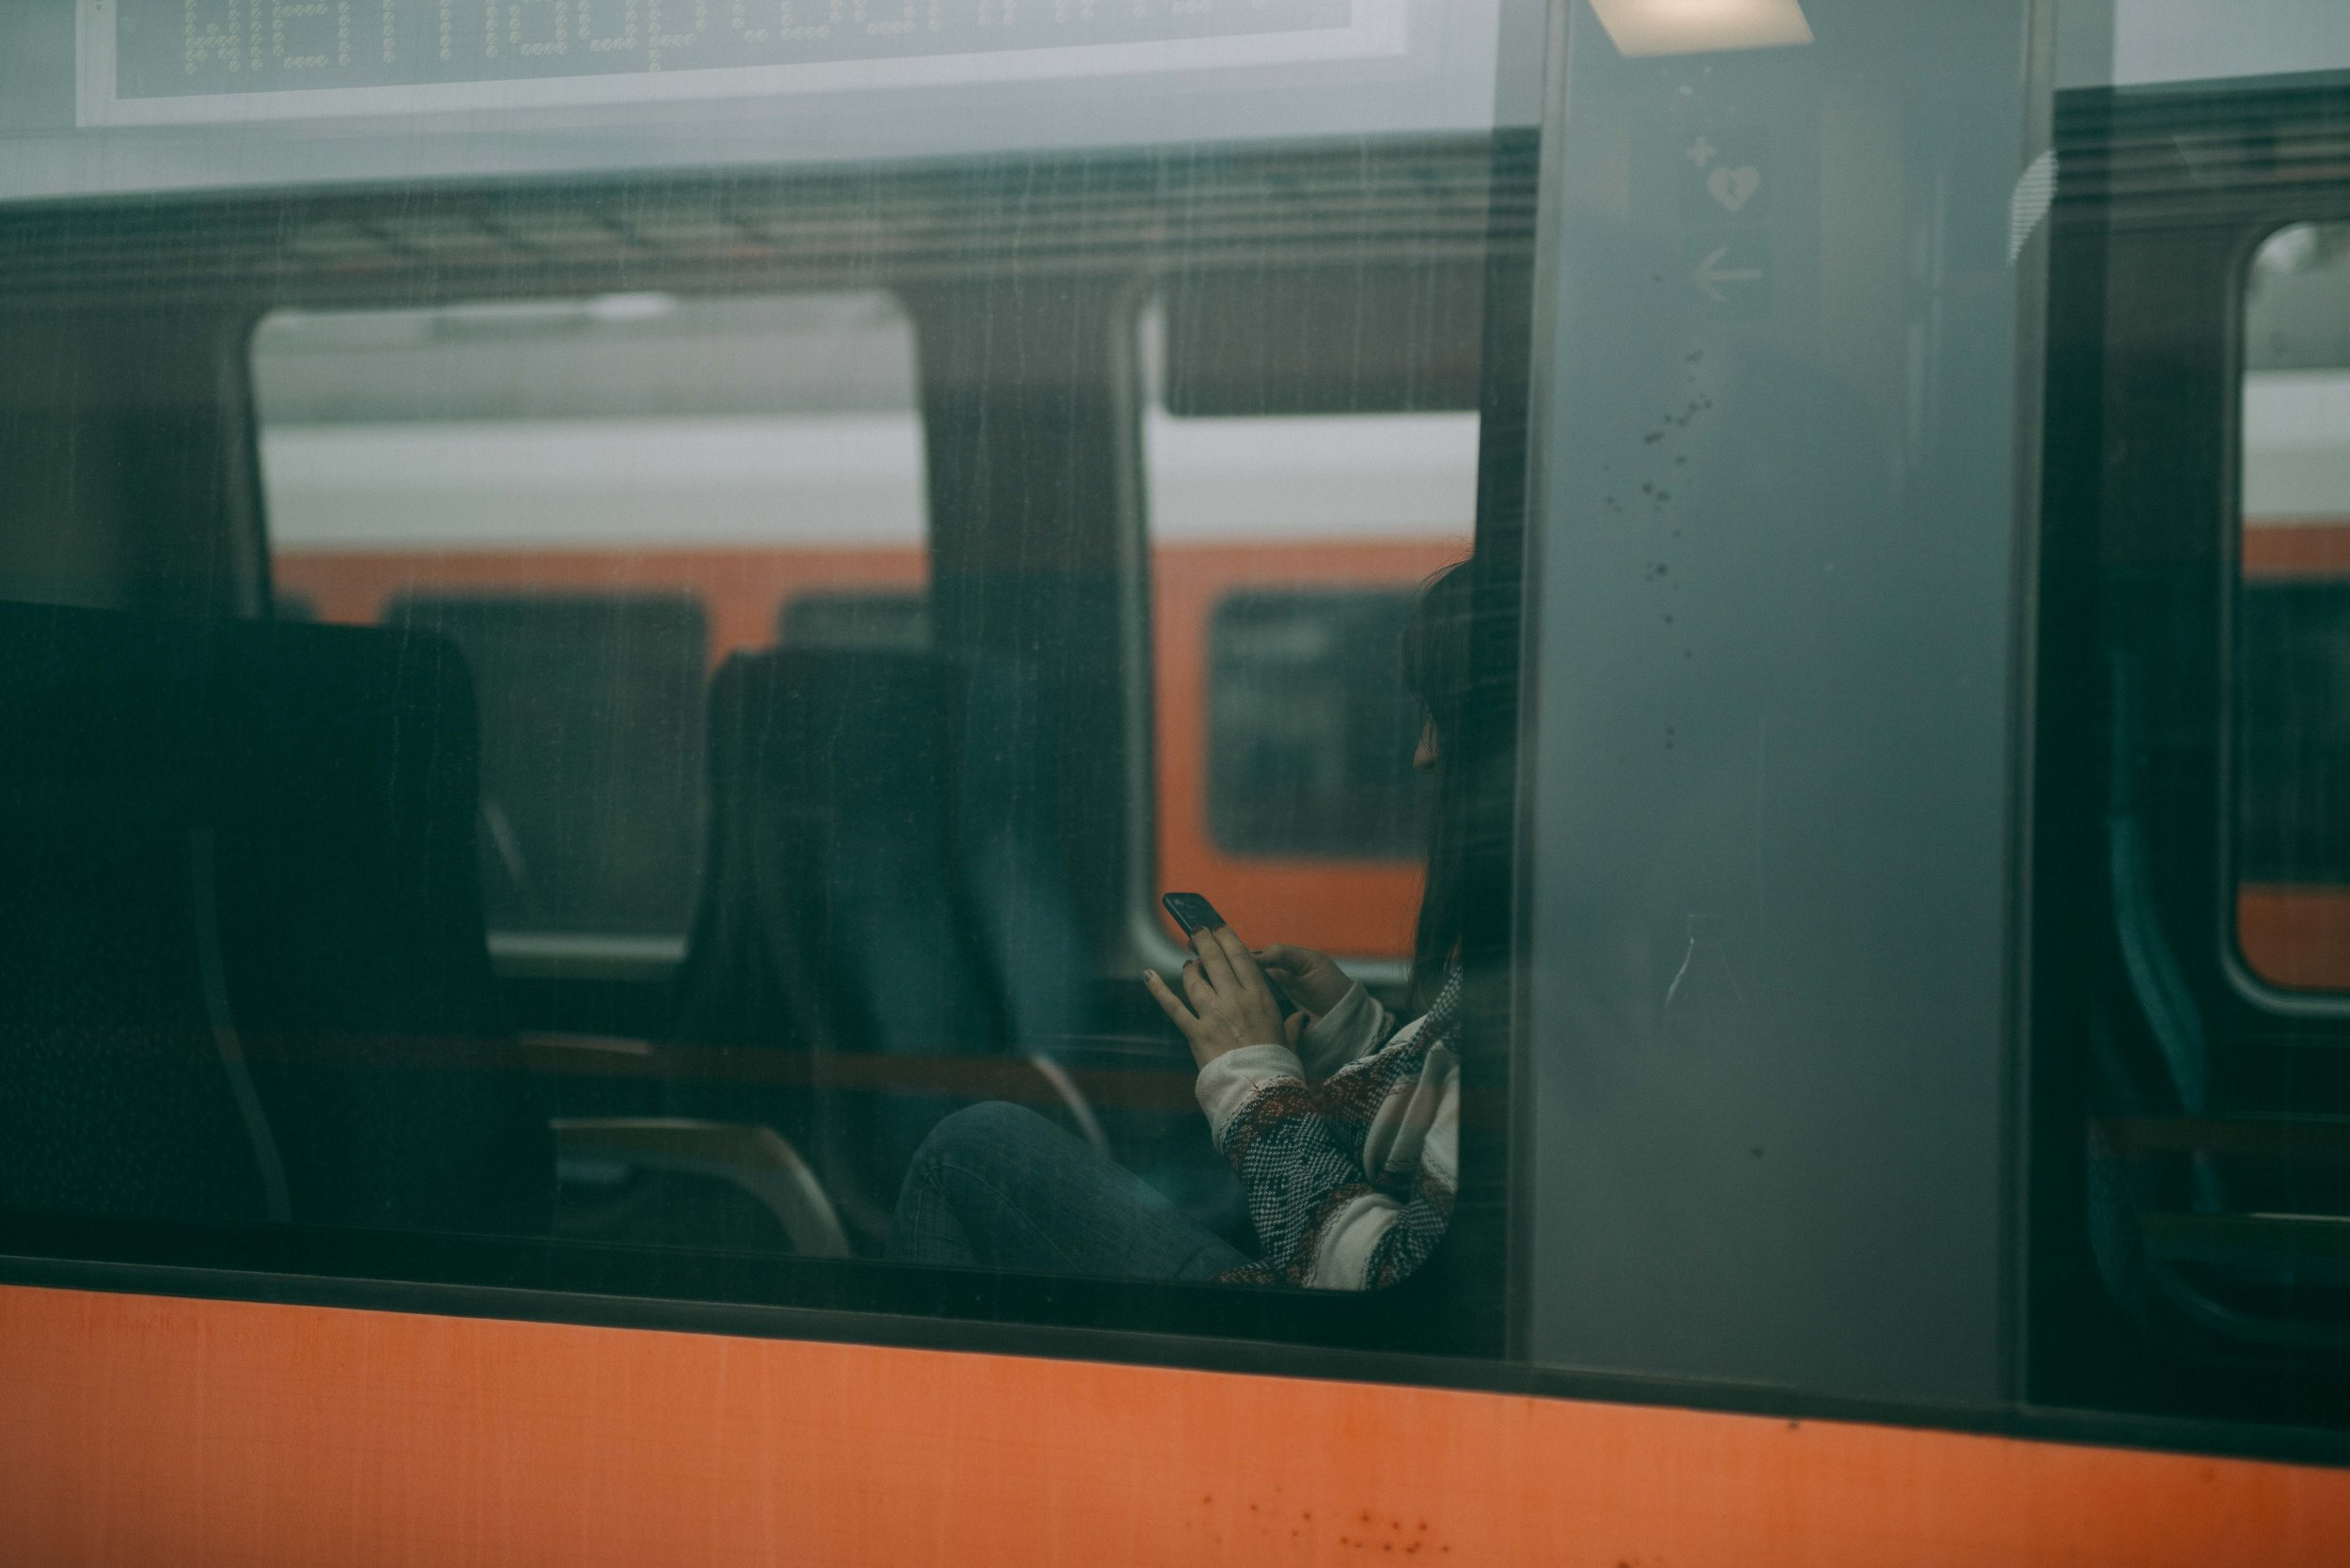 2018-3-8 Vienna-124 Resized.jpg